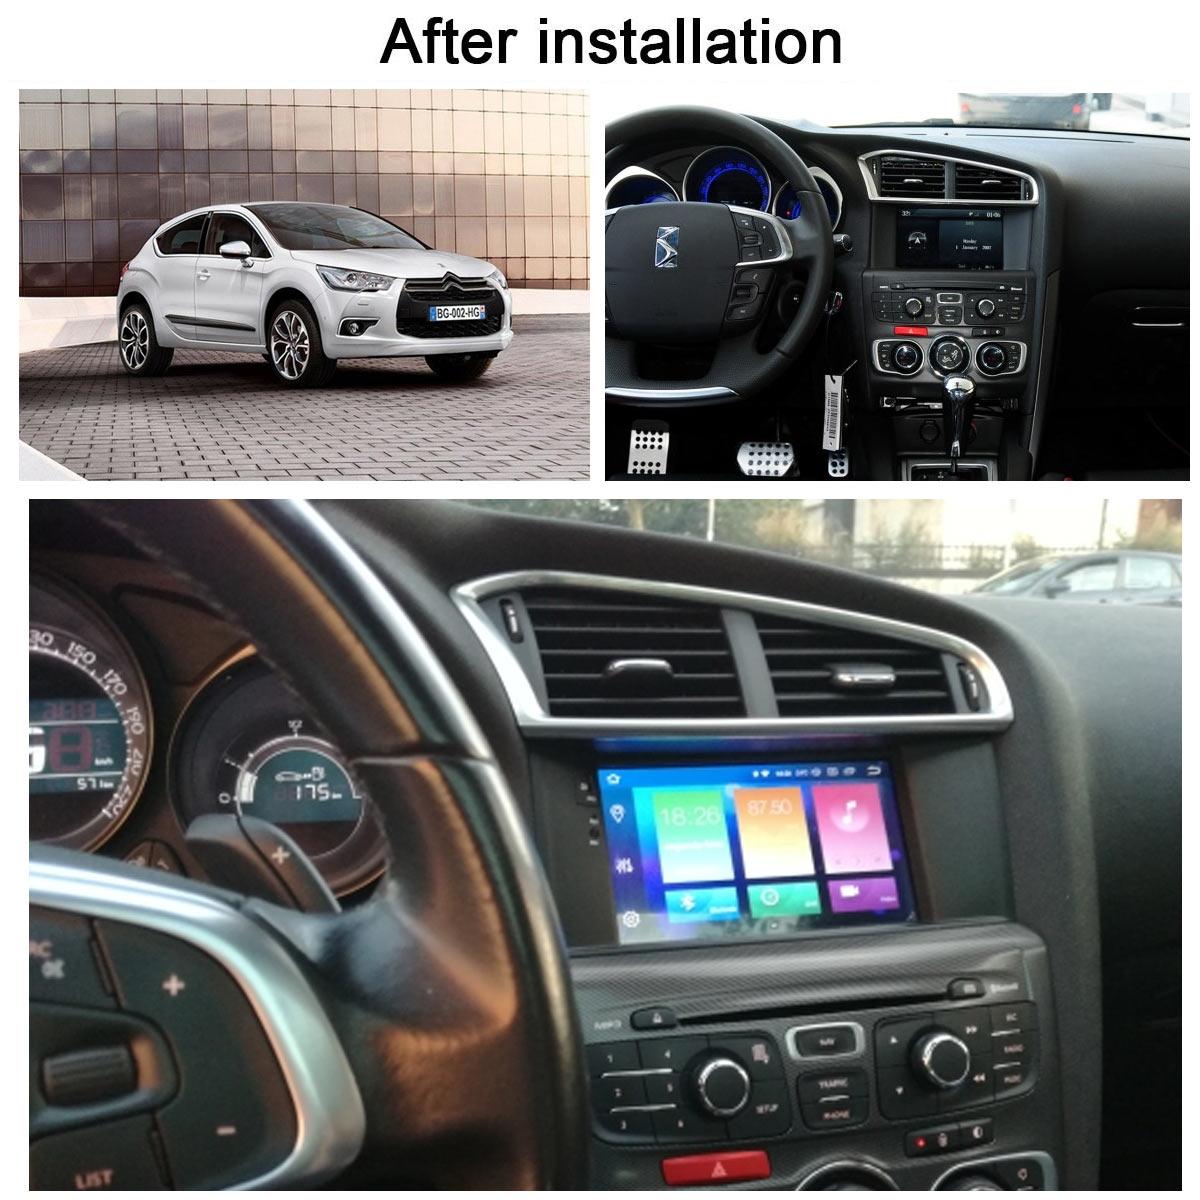 Citroen C4 C4L DS4 2011-2015 راديو السيارة لاعب أندرويد 10 64GB لتحديد المواقع والملاحة مشغل وسائط متعددة الراديو